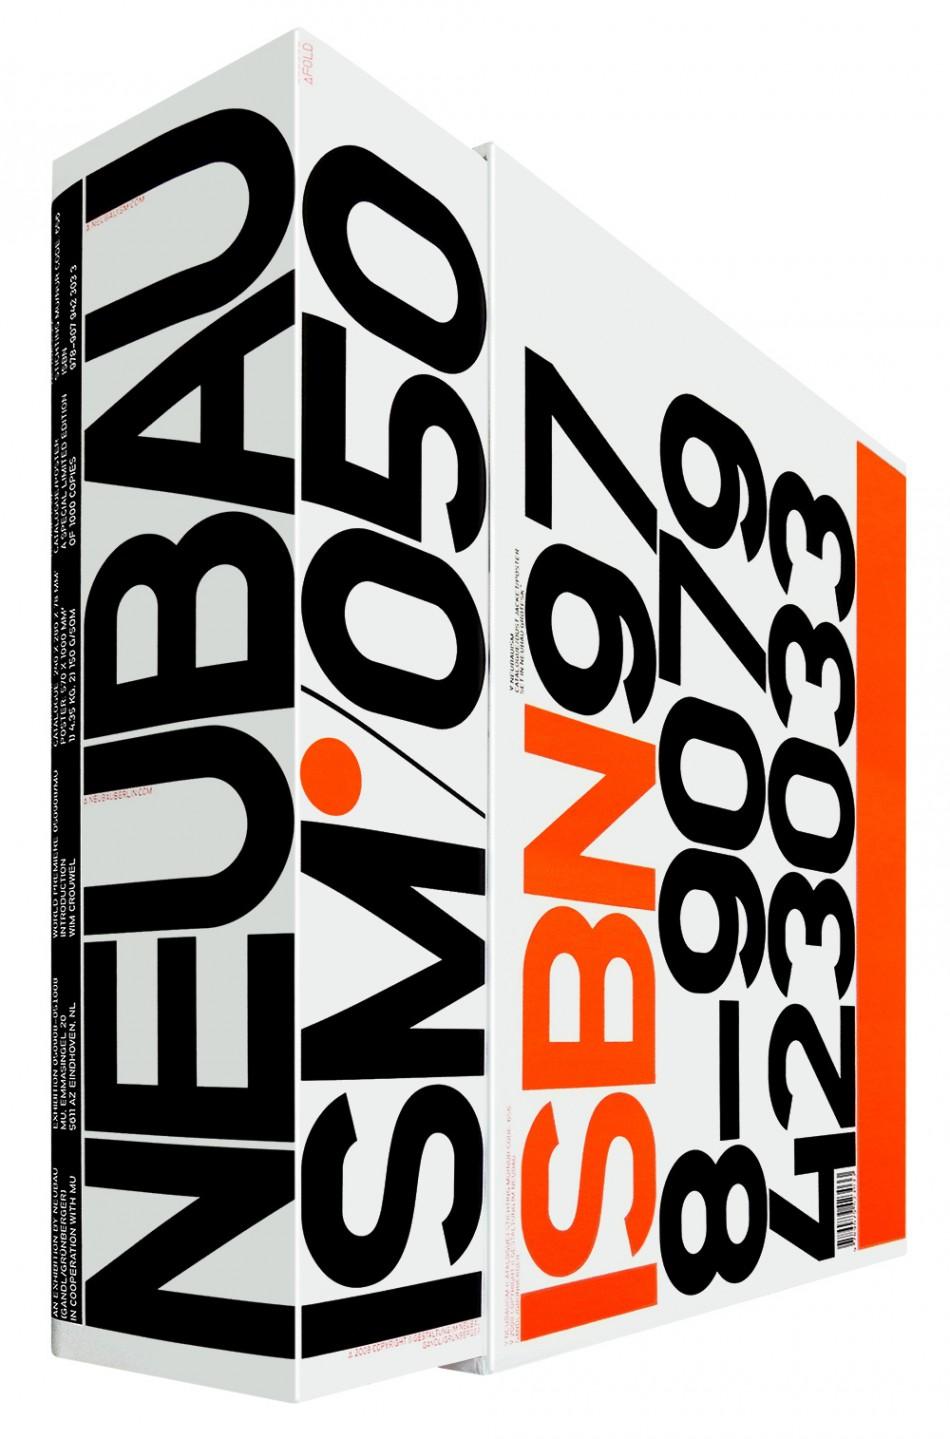 NBISM_BOX_3D